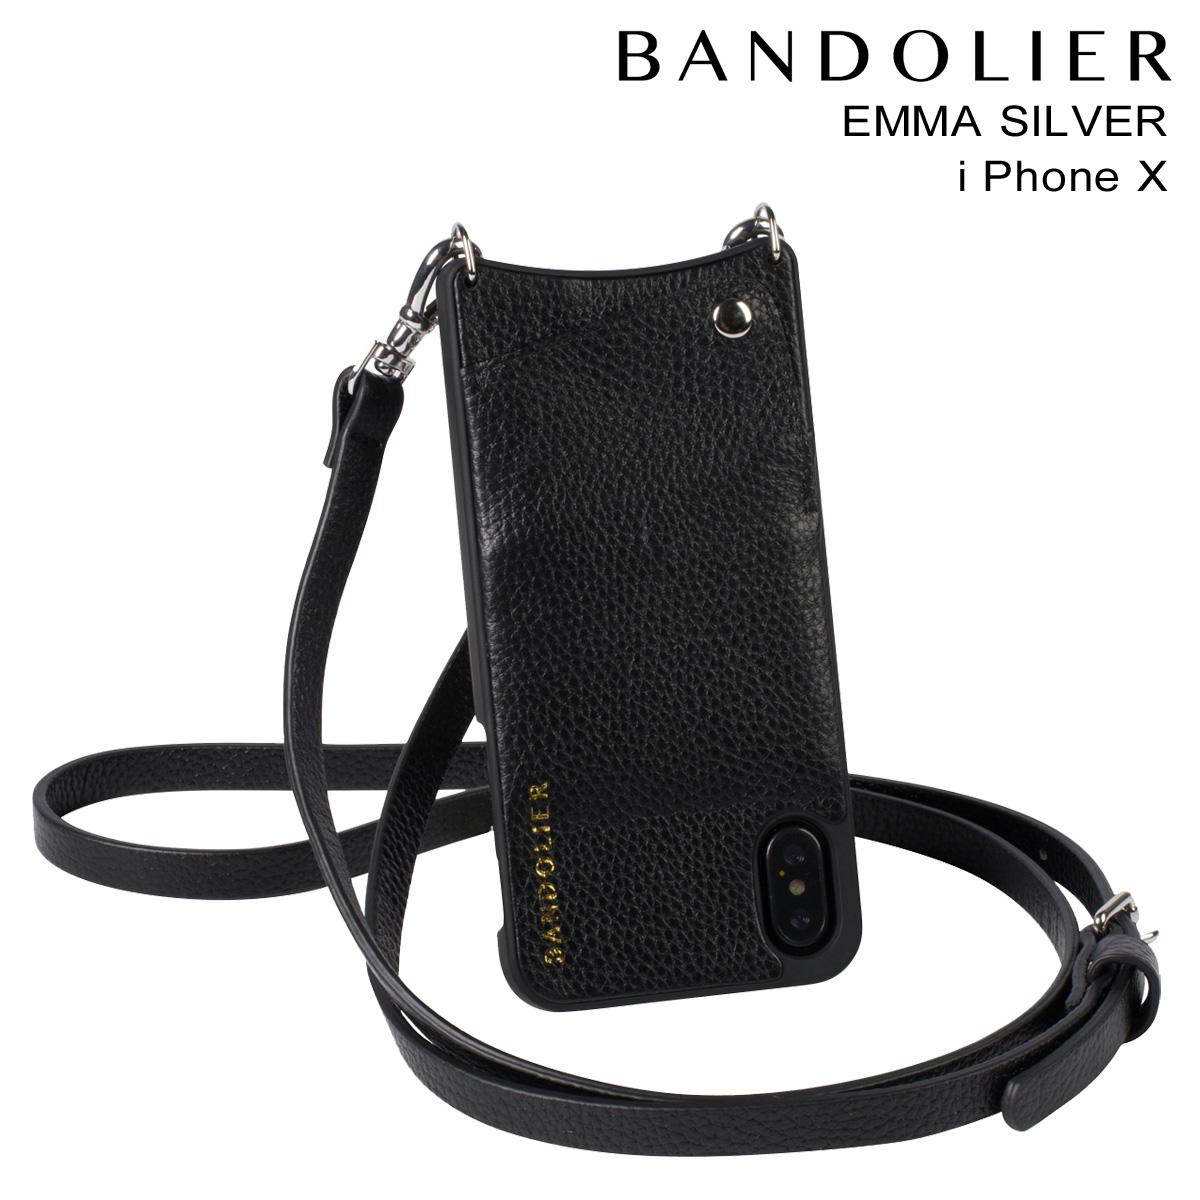 BANDOLIER バンドリヤー iPhoneX ケース スマホ アイフォン EMMA SILVER レザー メンズ レディース